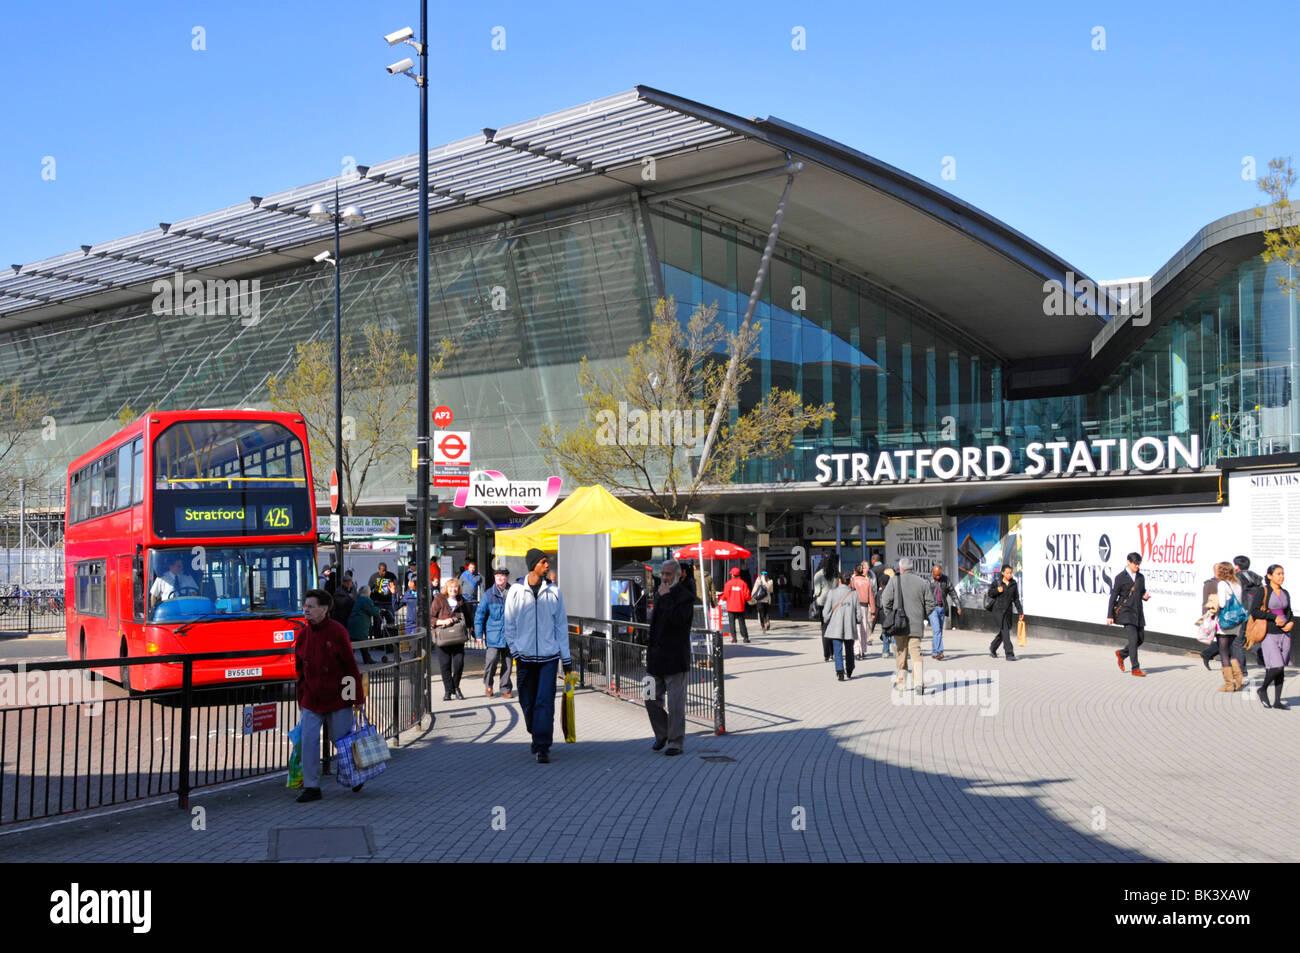 Stratford Railway Train Amp Bus Station With Westfield